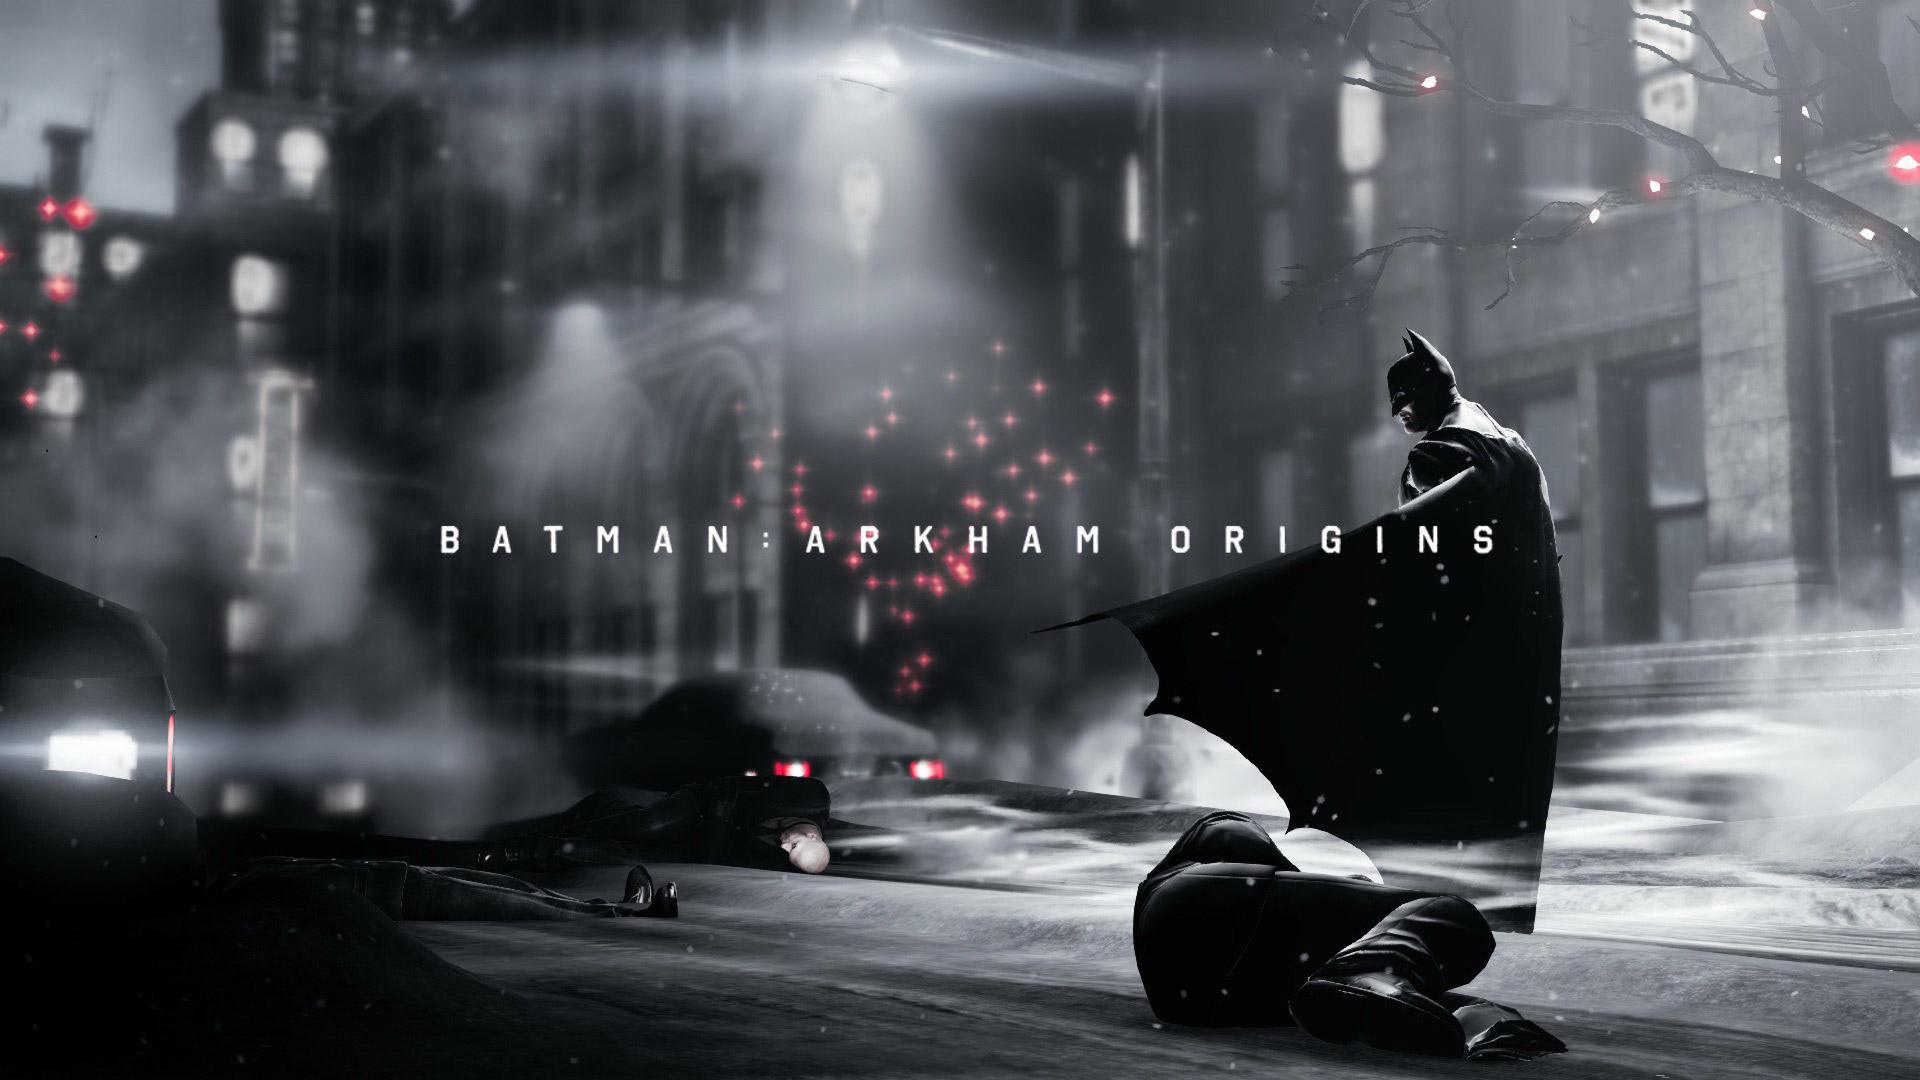 Free Batman: Arkham Origins Wallpaper in 1920x1080